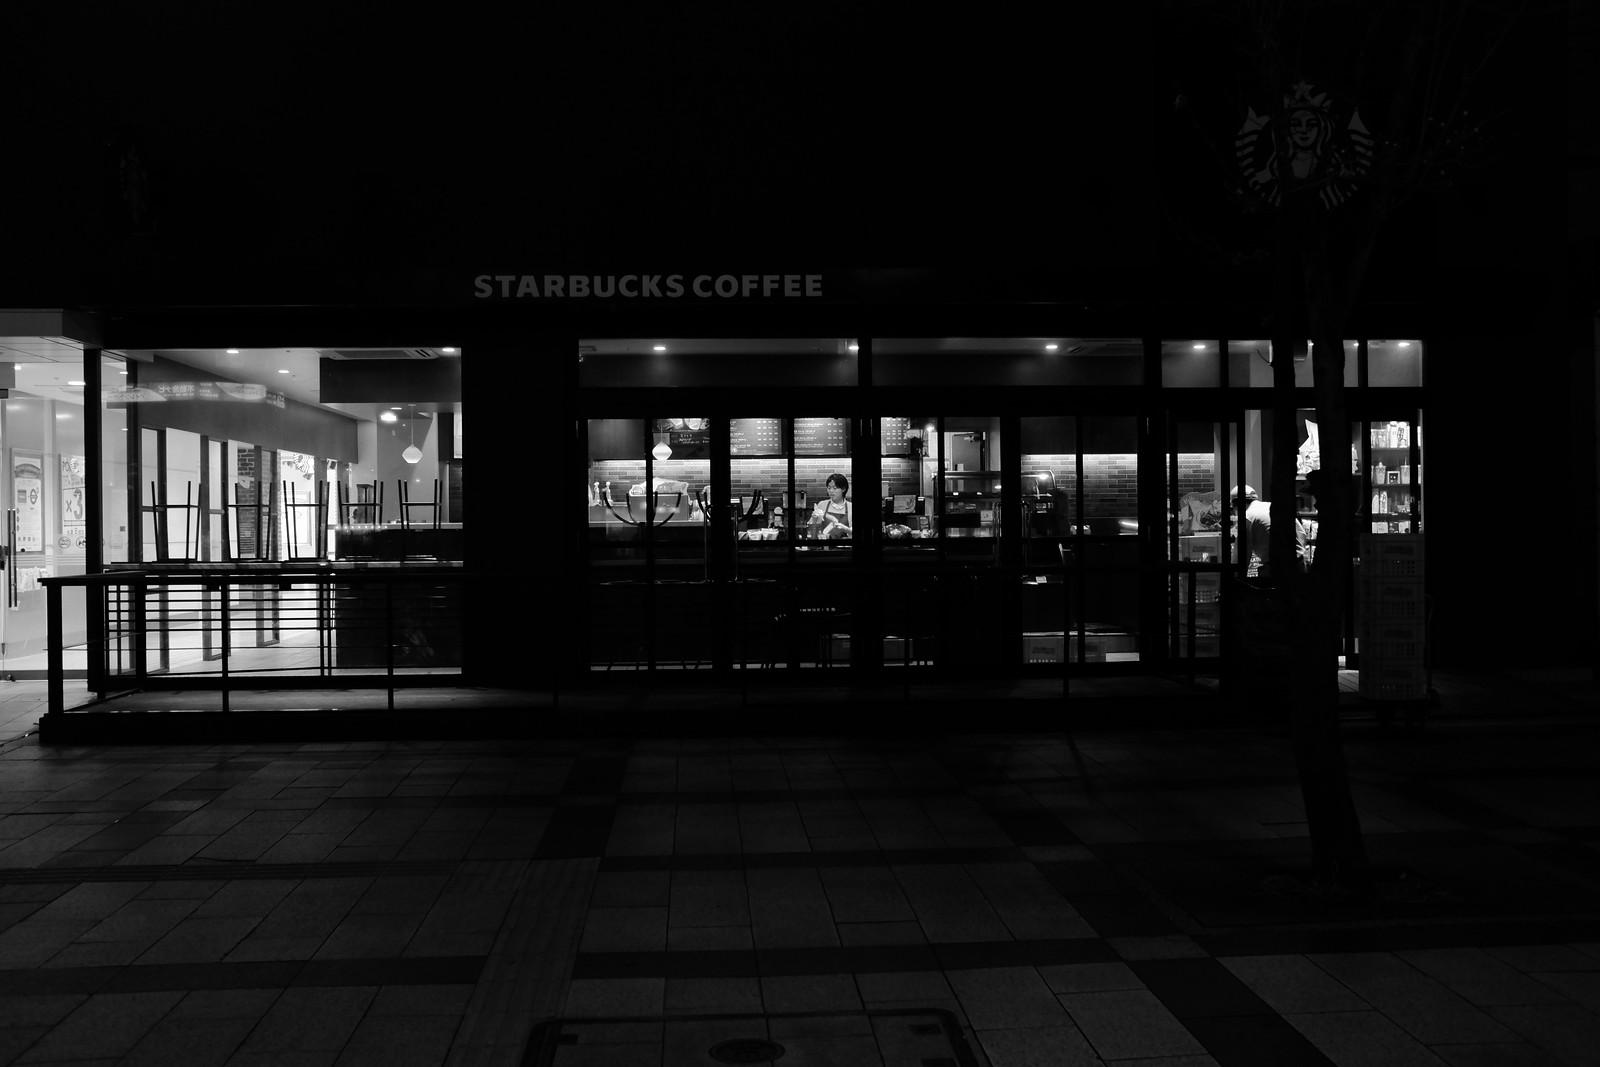 Sumidaku Kinshicho night photo in Tokyo, Japan.